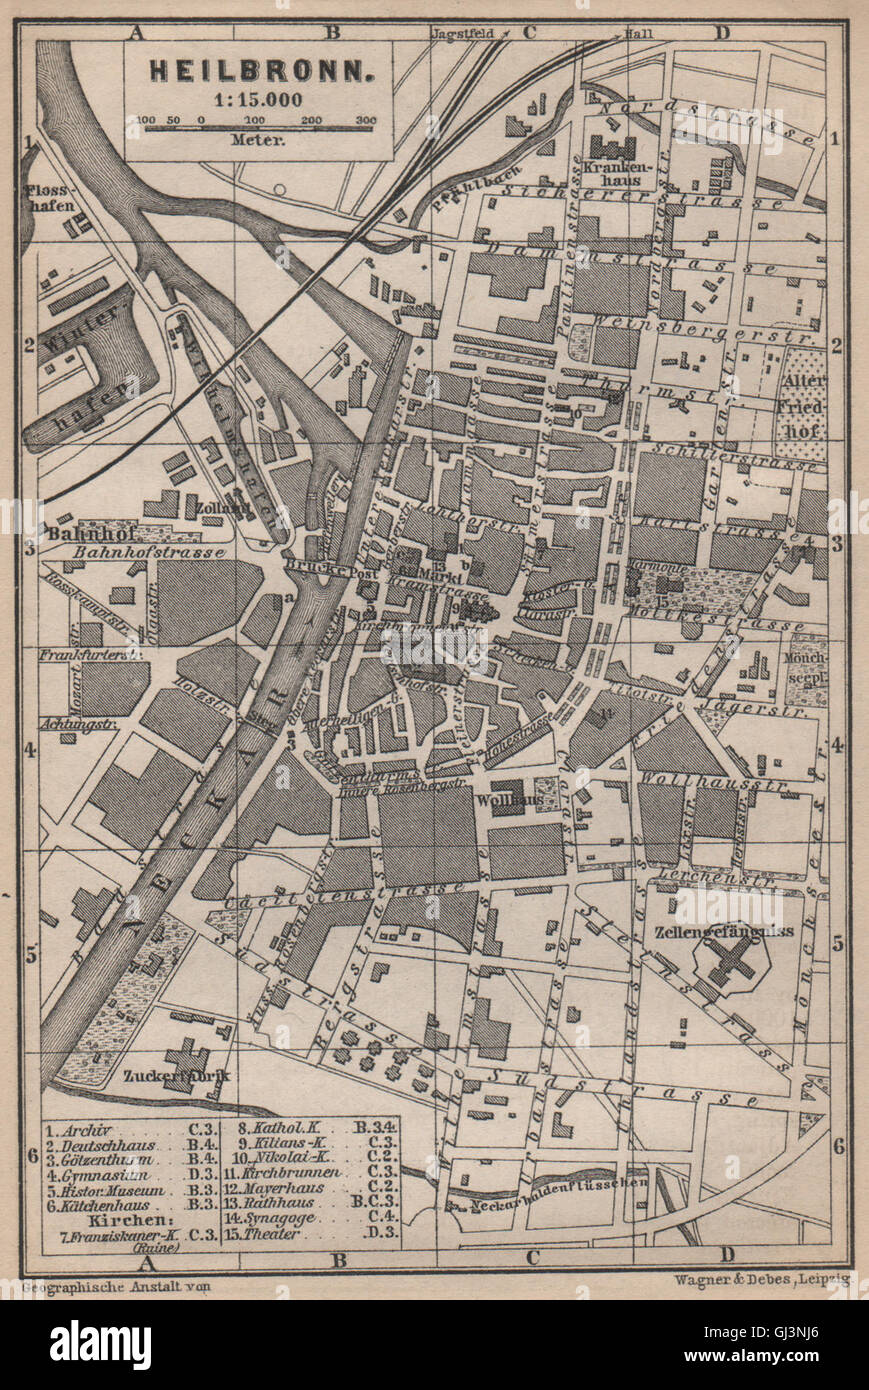 Heilbronn Karte Stadtplan.Heilbronn Antique Town City Stadtplan Baden Wurttemberg